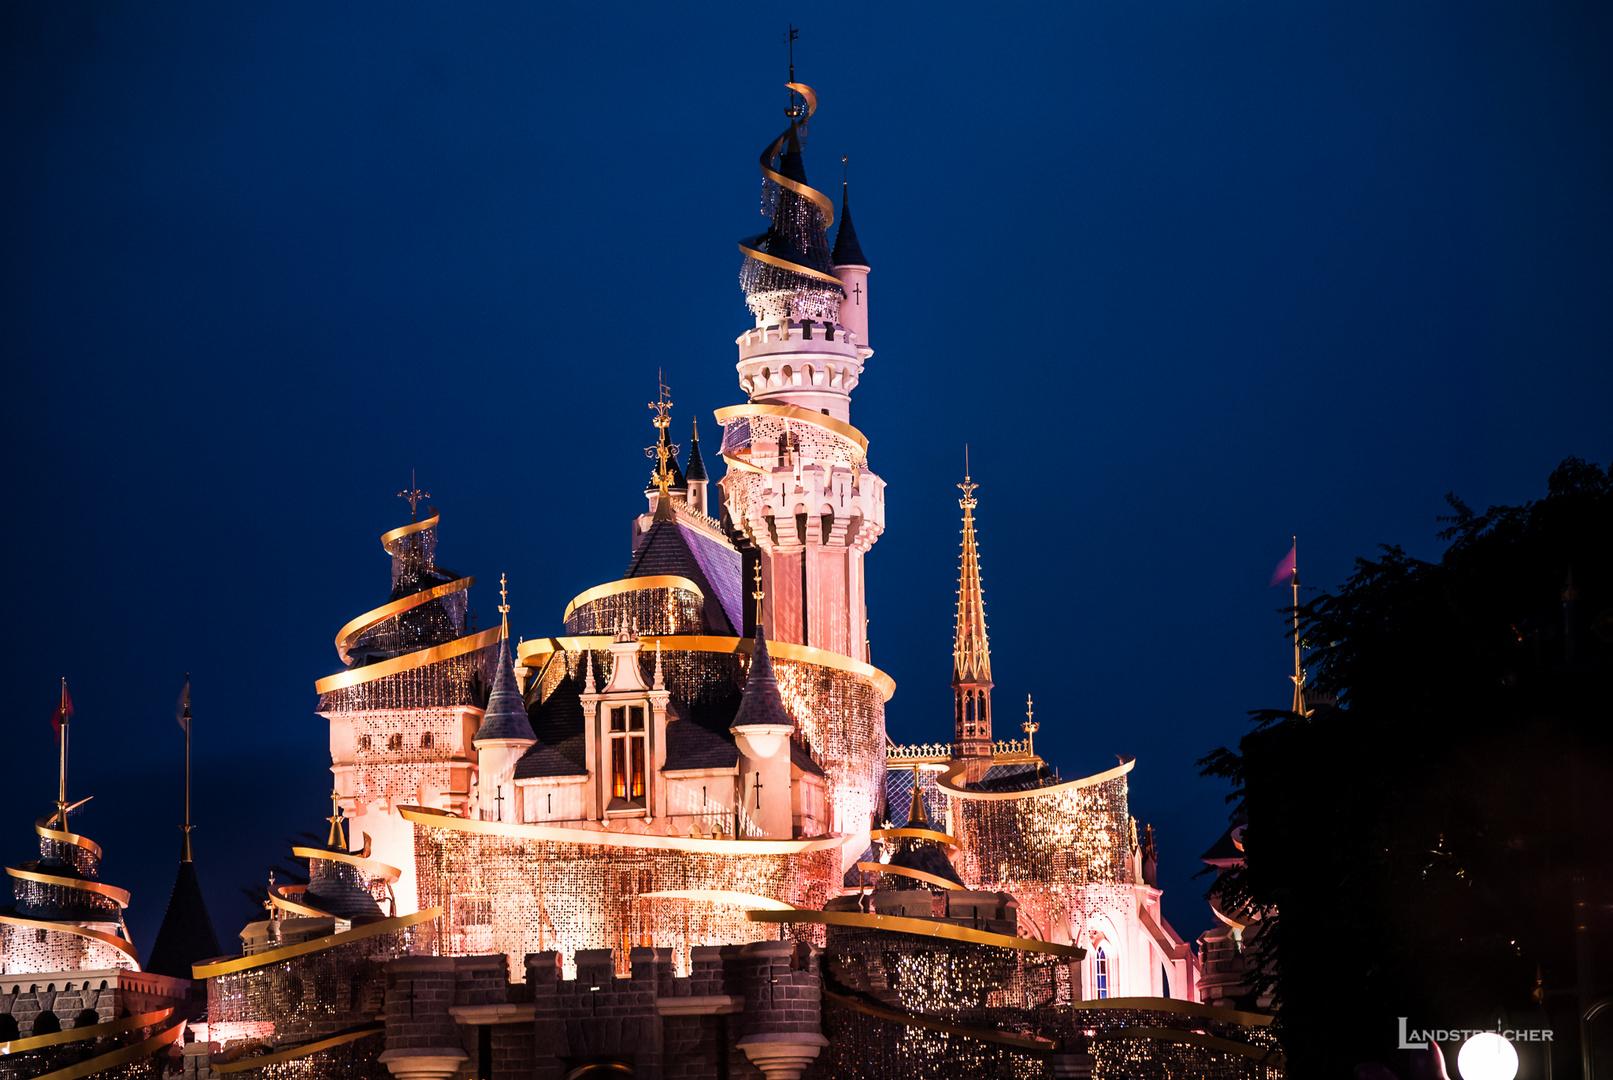 Märchenschloss im Disneyland Hong Kong